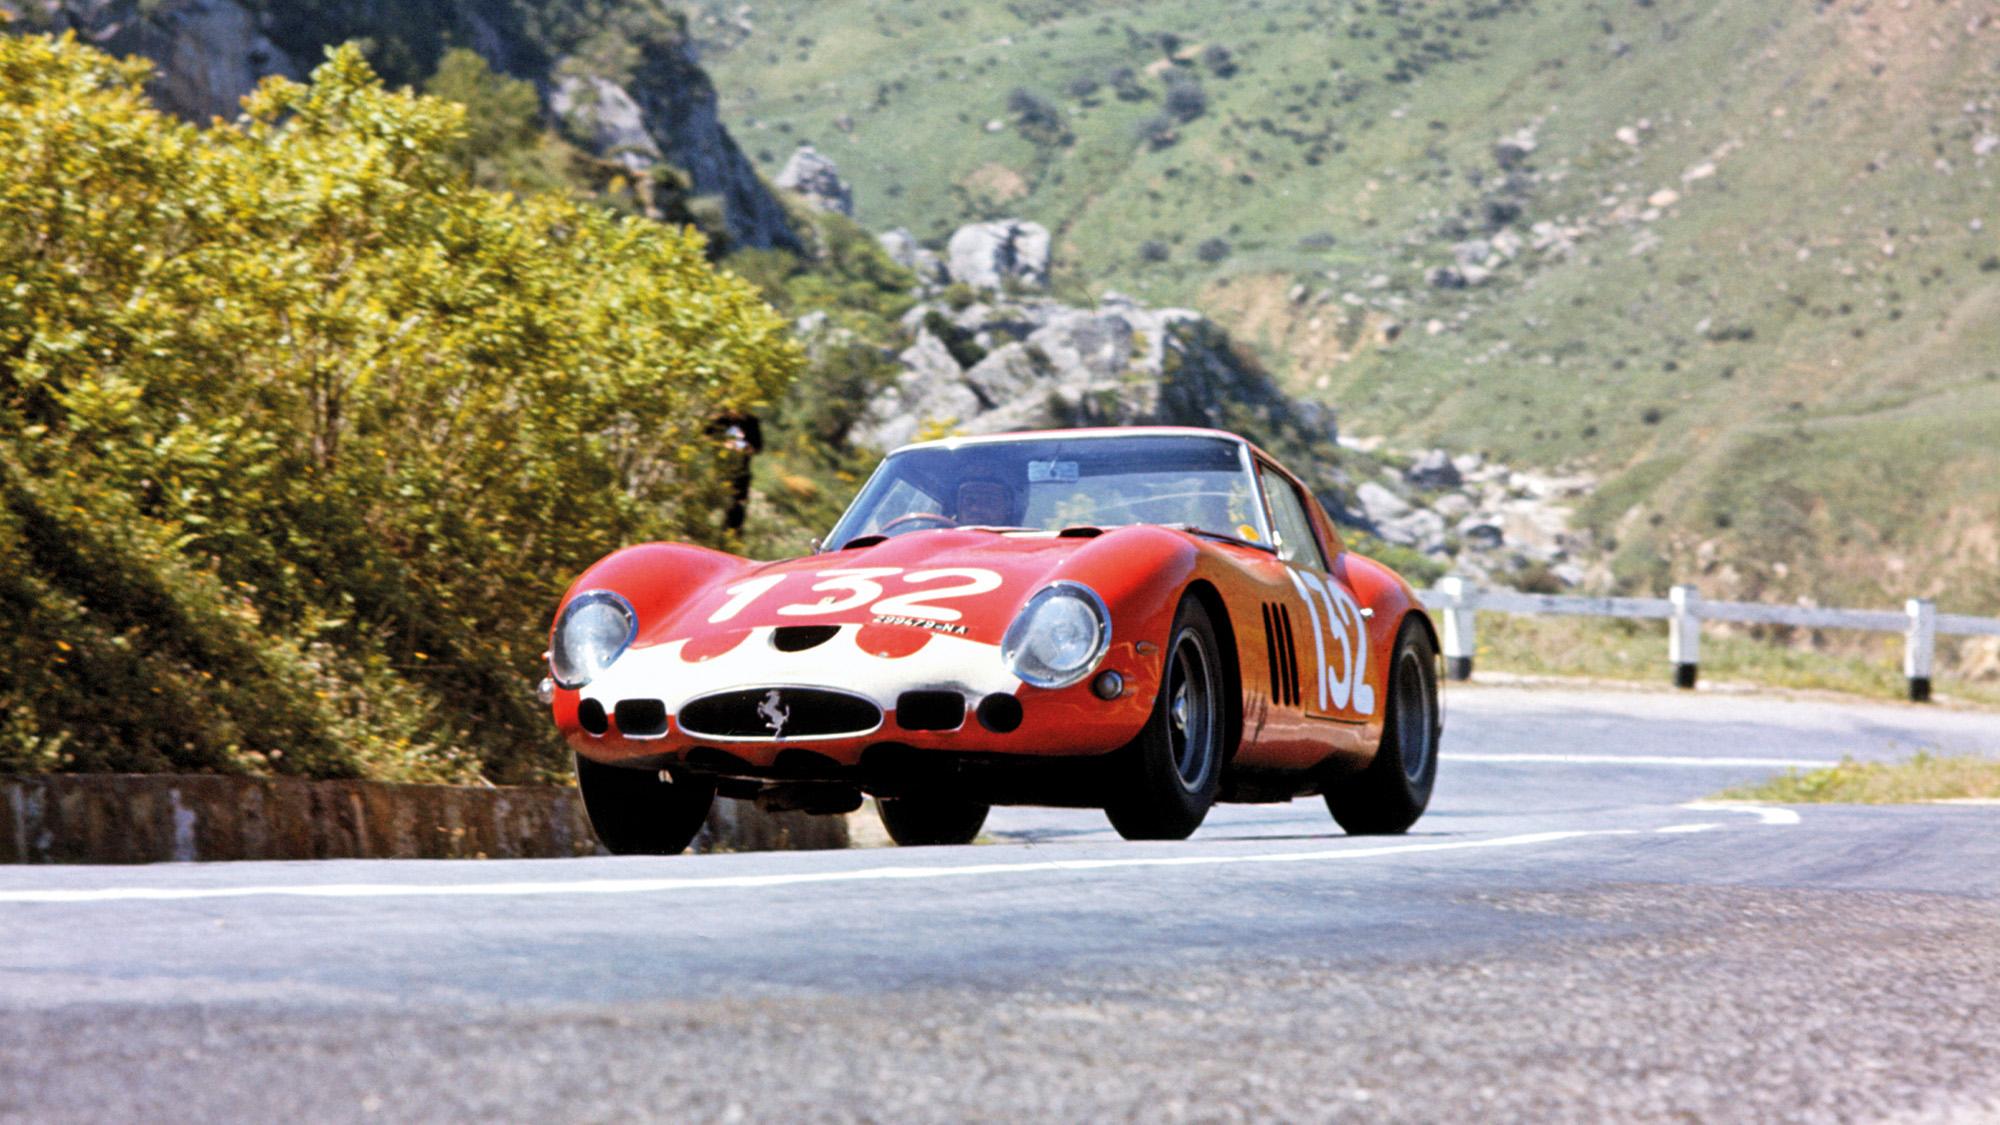 Ferrari 250 GTO in 1964 Targa Florio